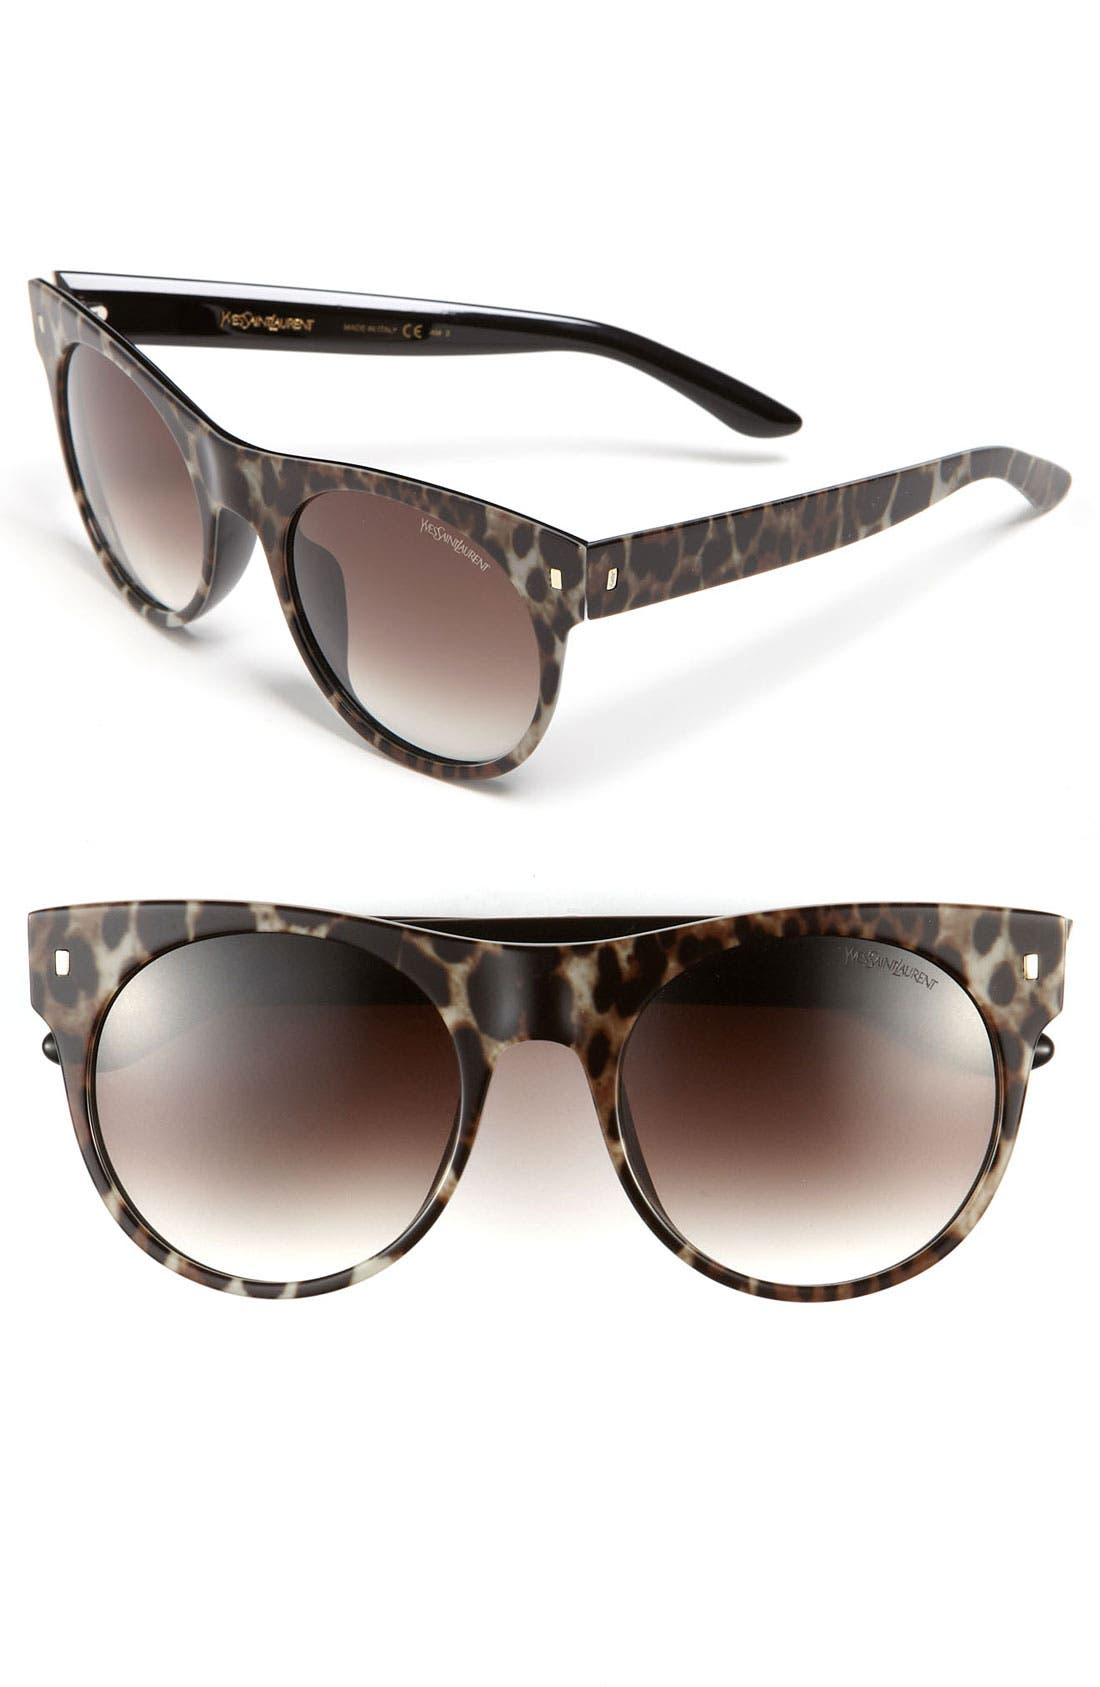 Alternate Image 1 Selected - Yves Saint Laurent Retro Sunglasses